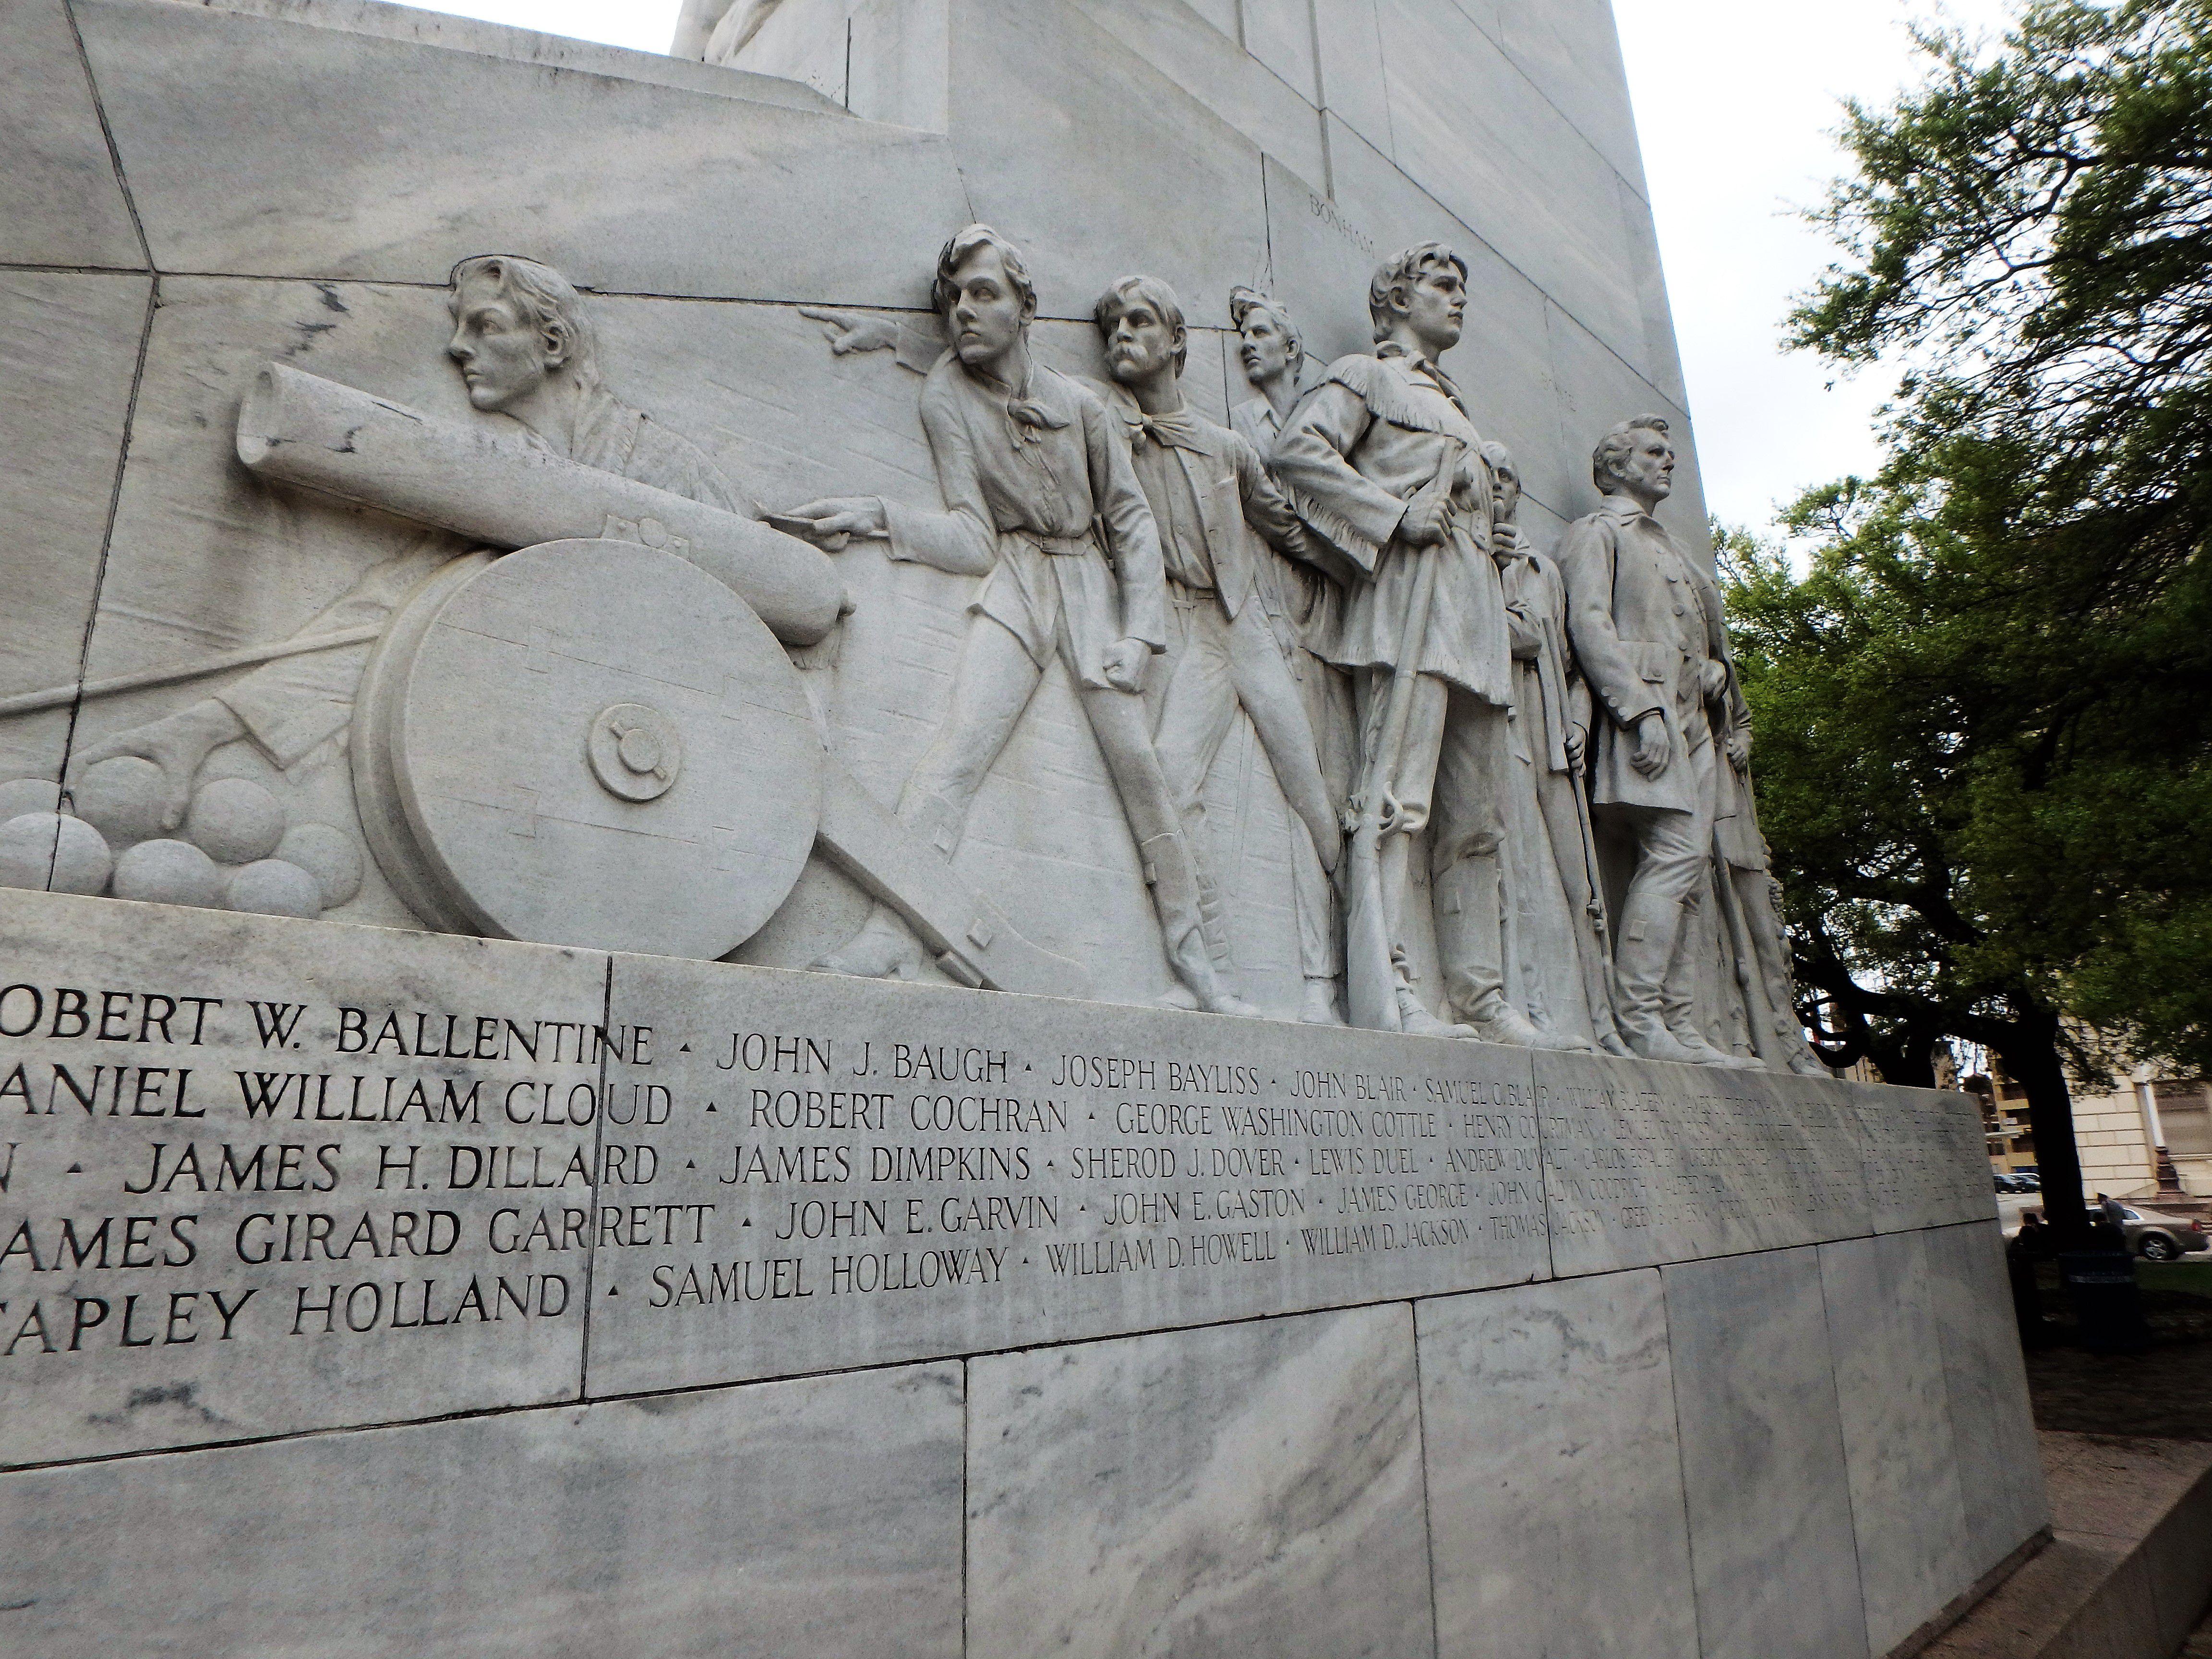 The Alamo Cenotaph in San Antonio, Texas, USA